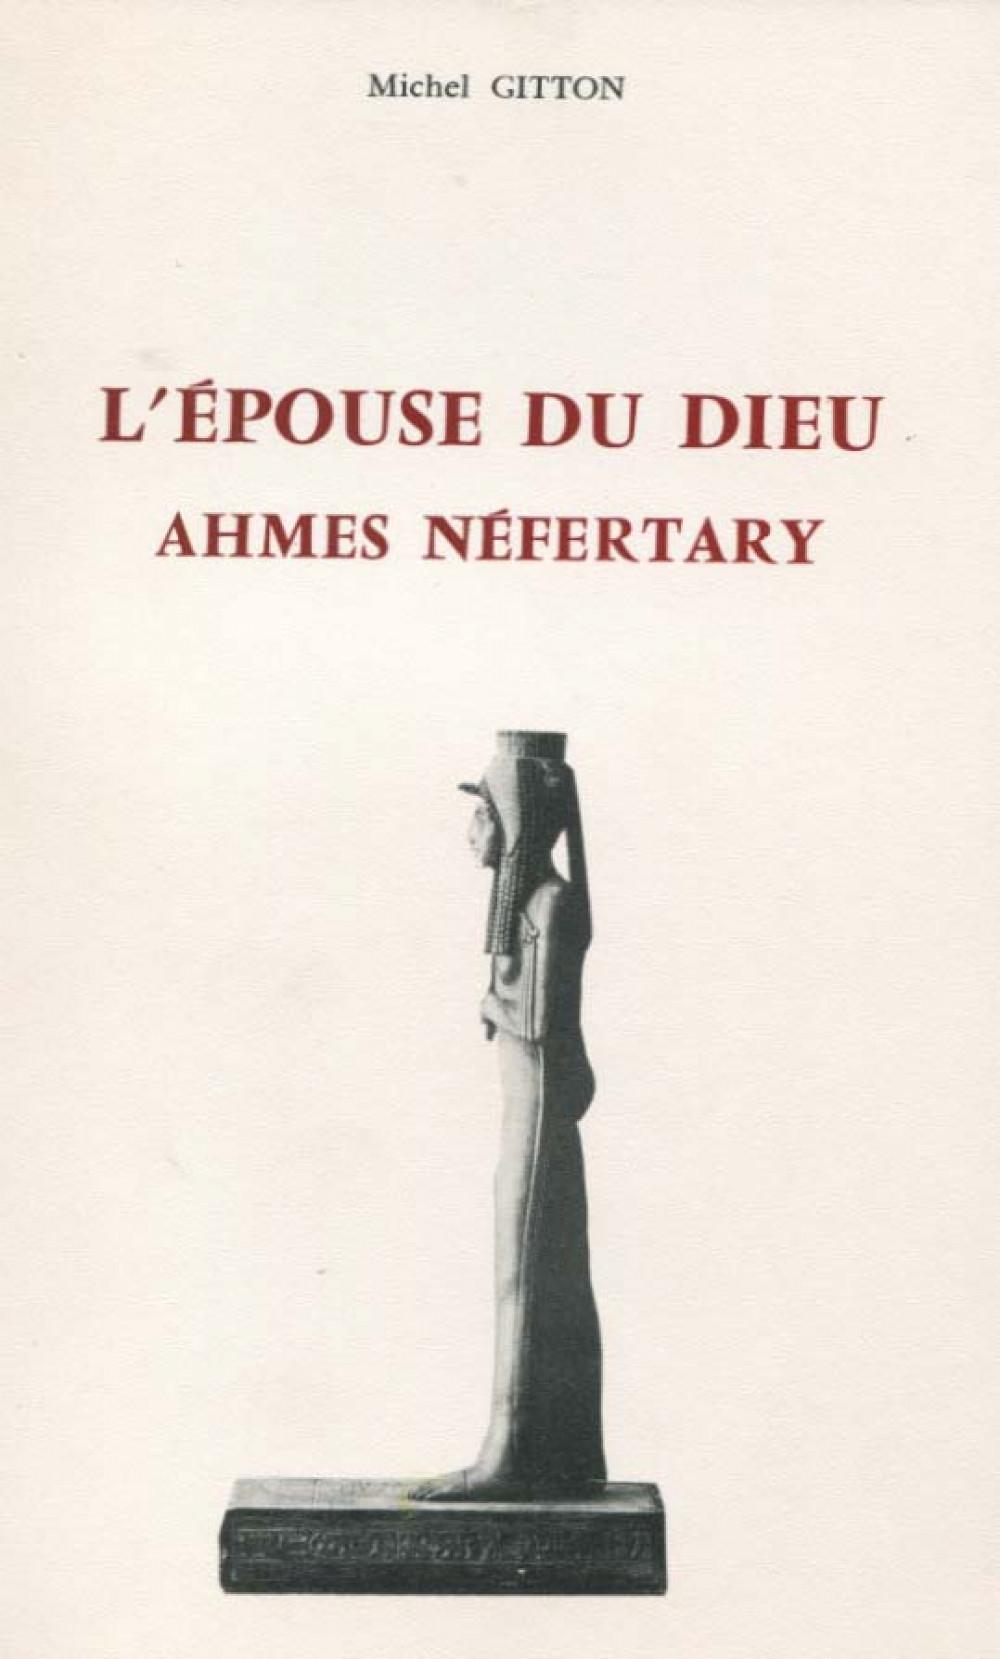 L'épouse du dieu Ahmes Néfertary